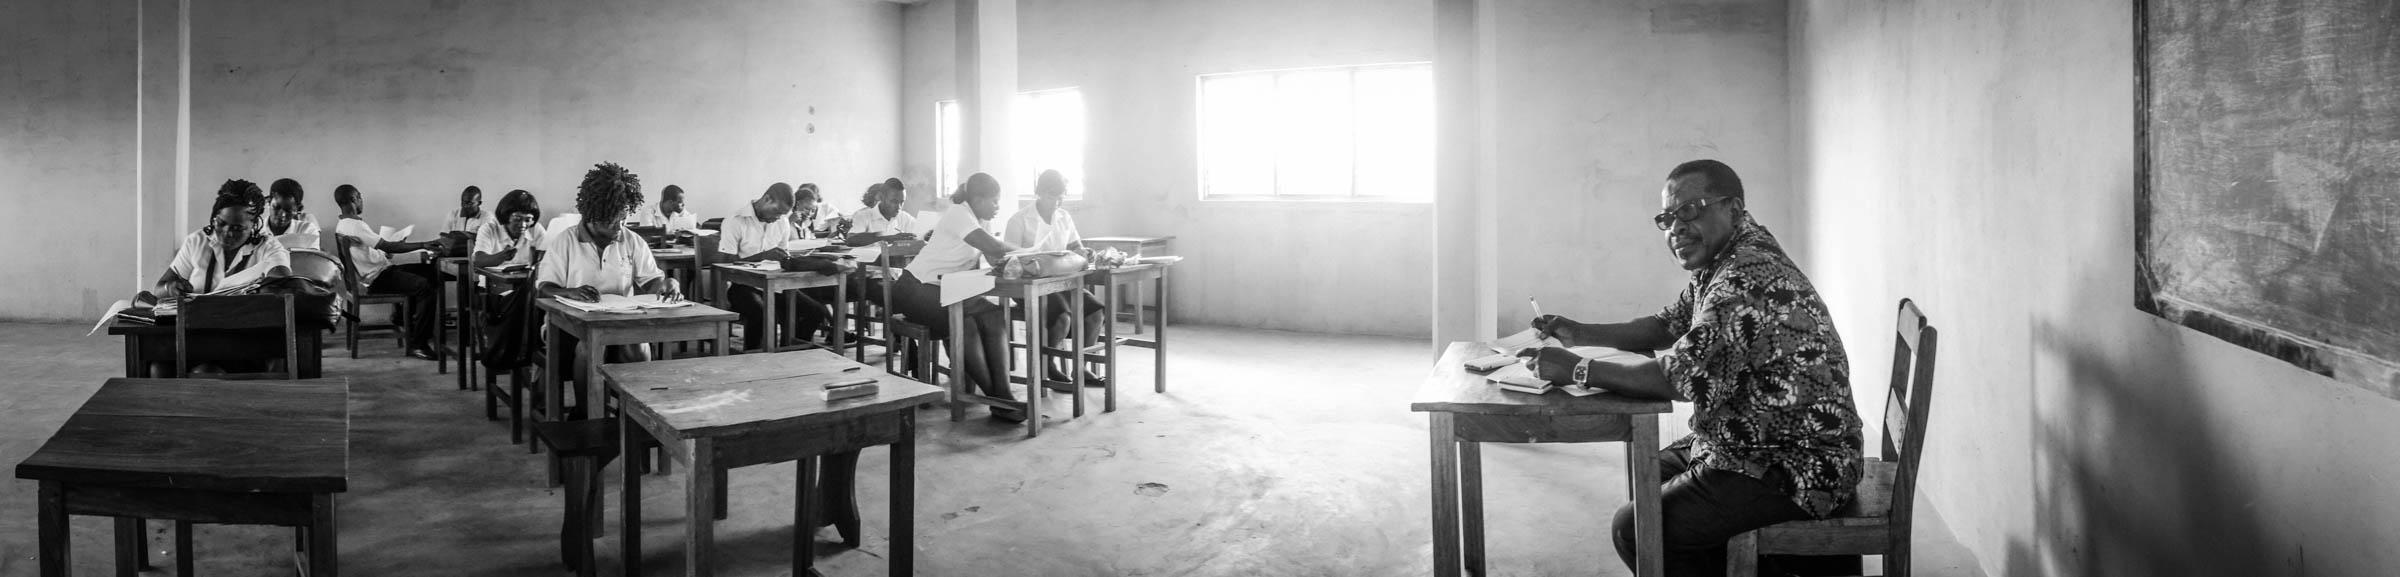 Togolese schoolteacher (2014)